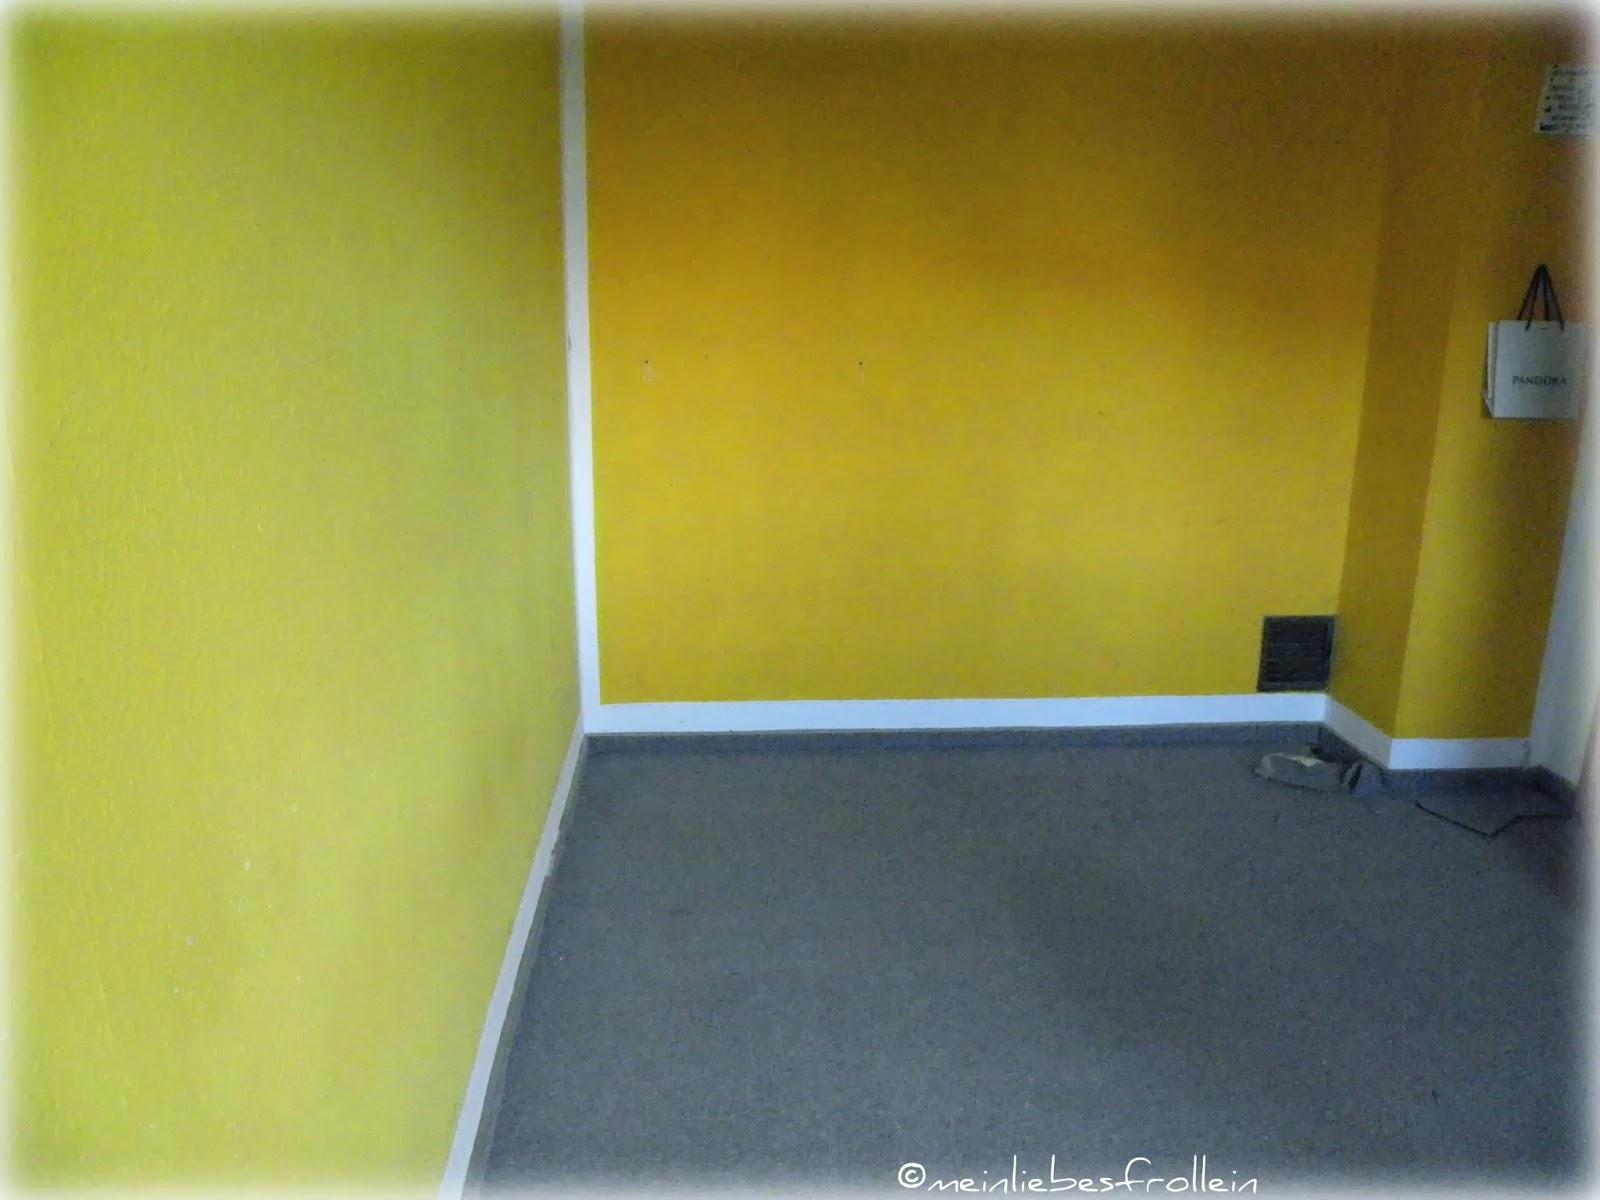 mein liebes frollein oktober 2013. Black Bedroom Furniture Sets. Home Design Ideas